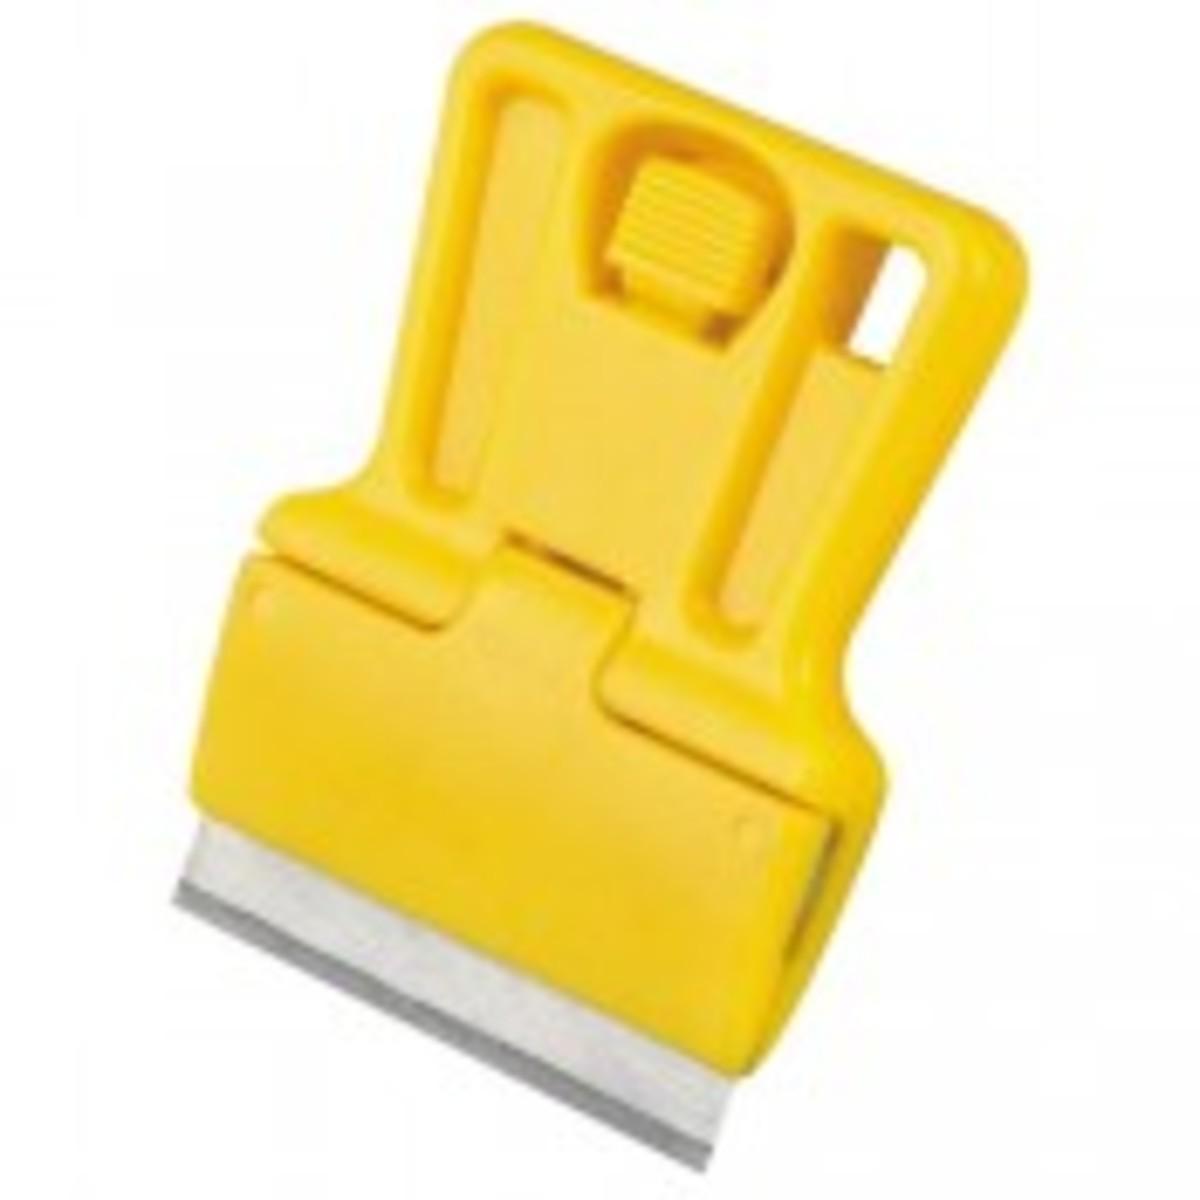 Scraper - single edge razor blade holder